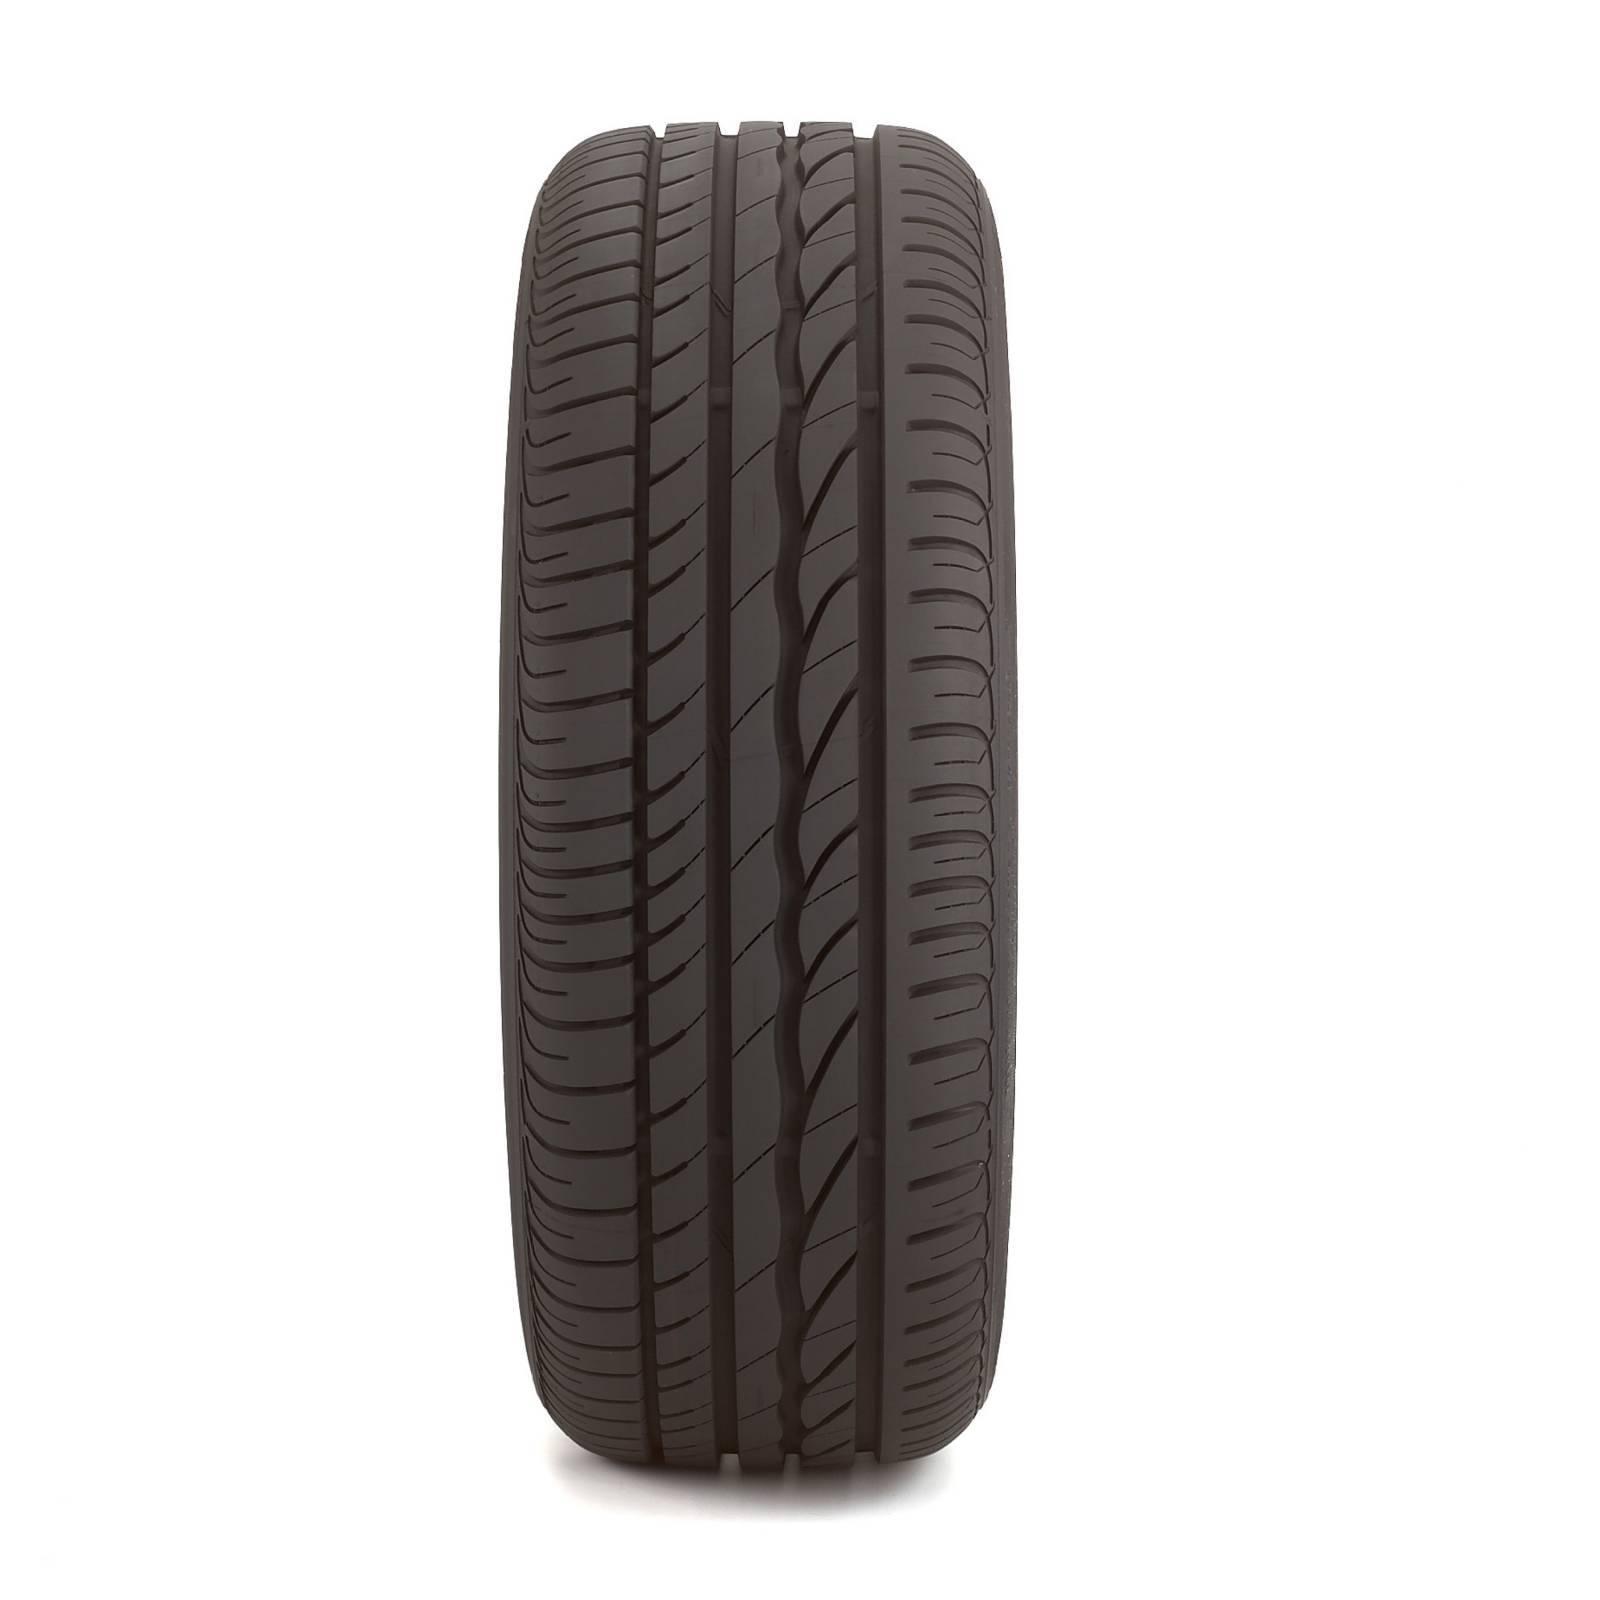 Pneu Bridgestone Turanza ER300 Ecopia 225/50 R17 94V - Cantele Centro Automotivo